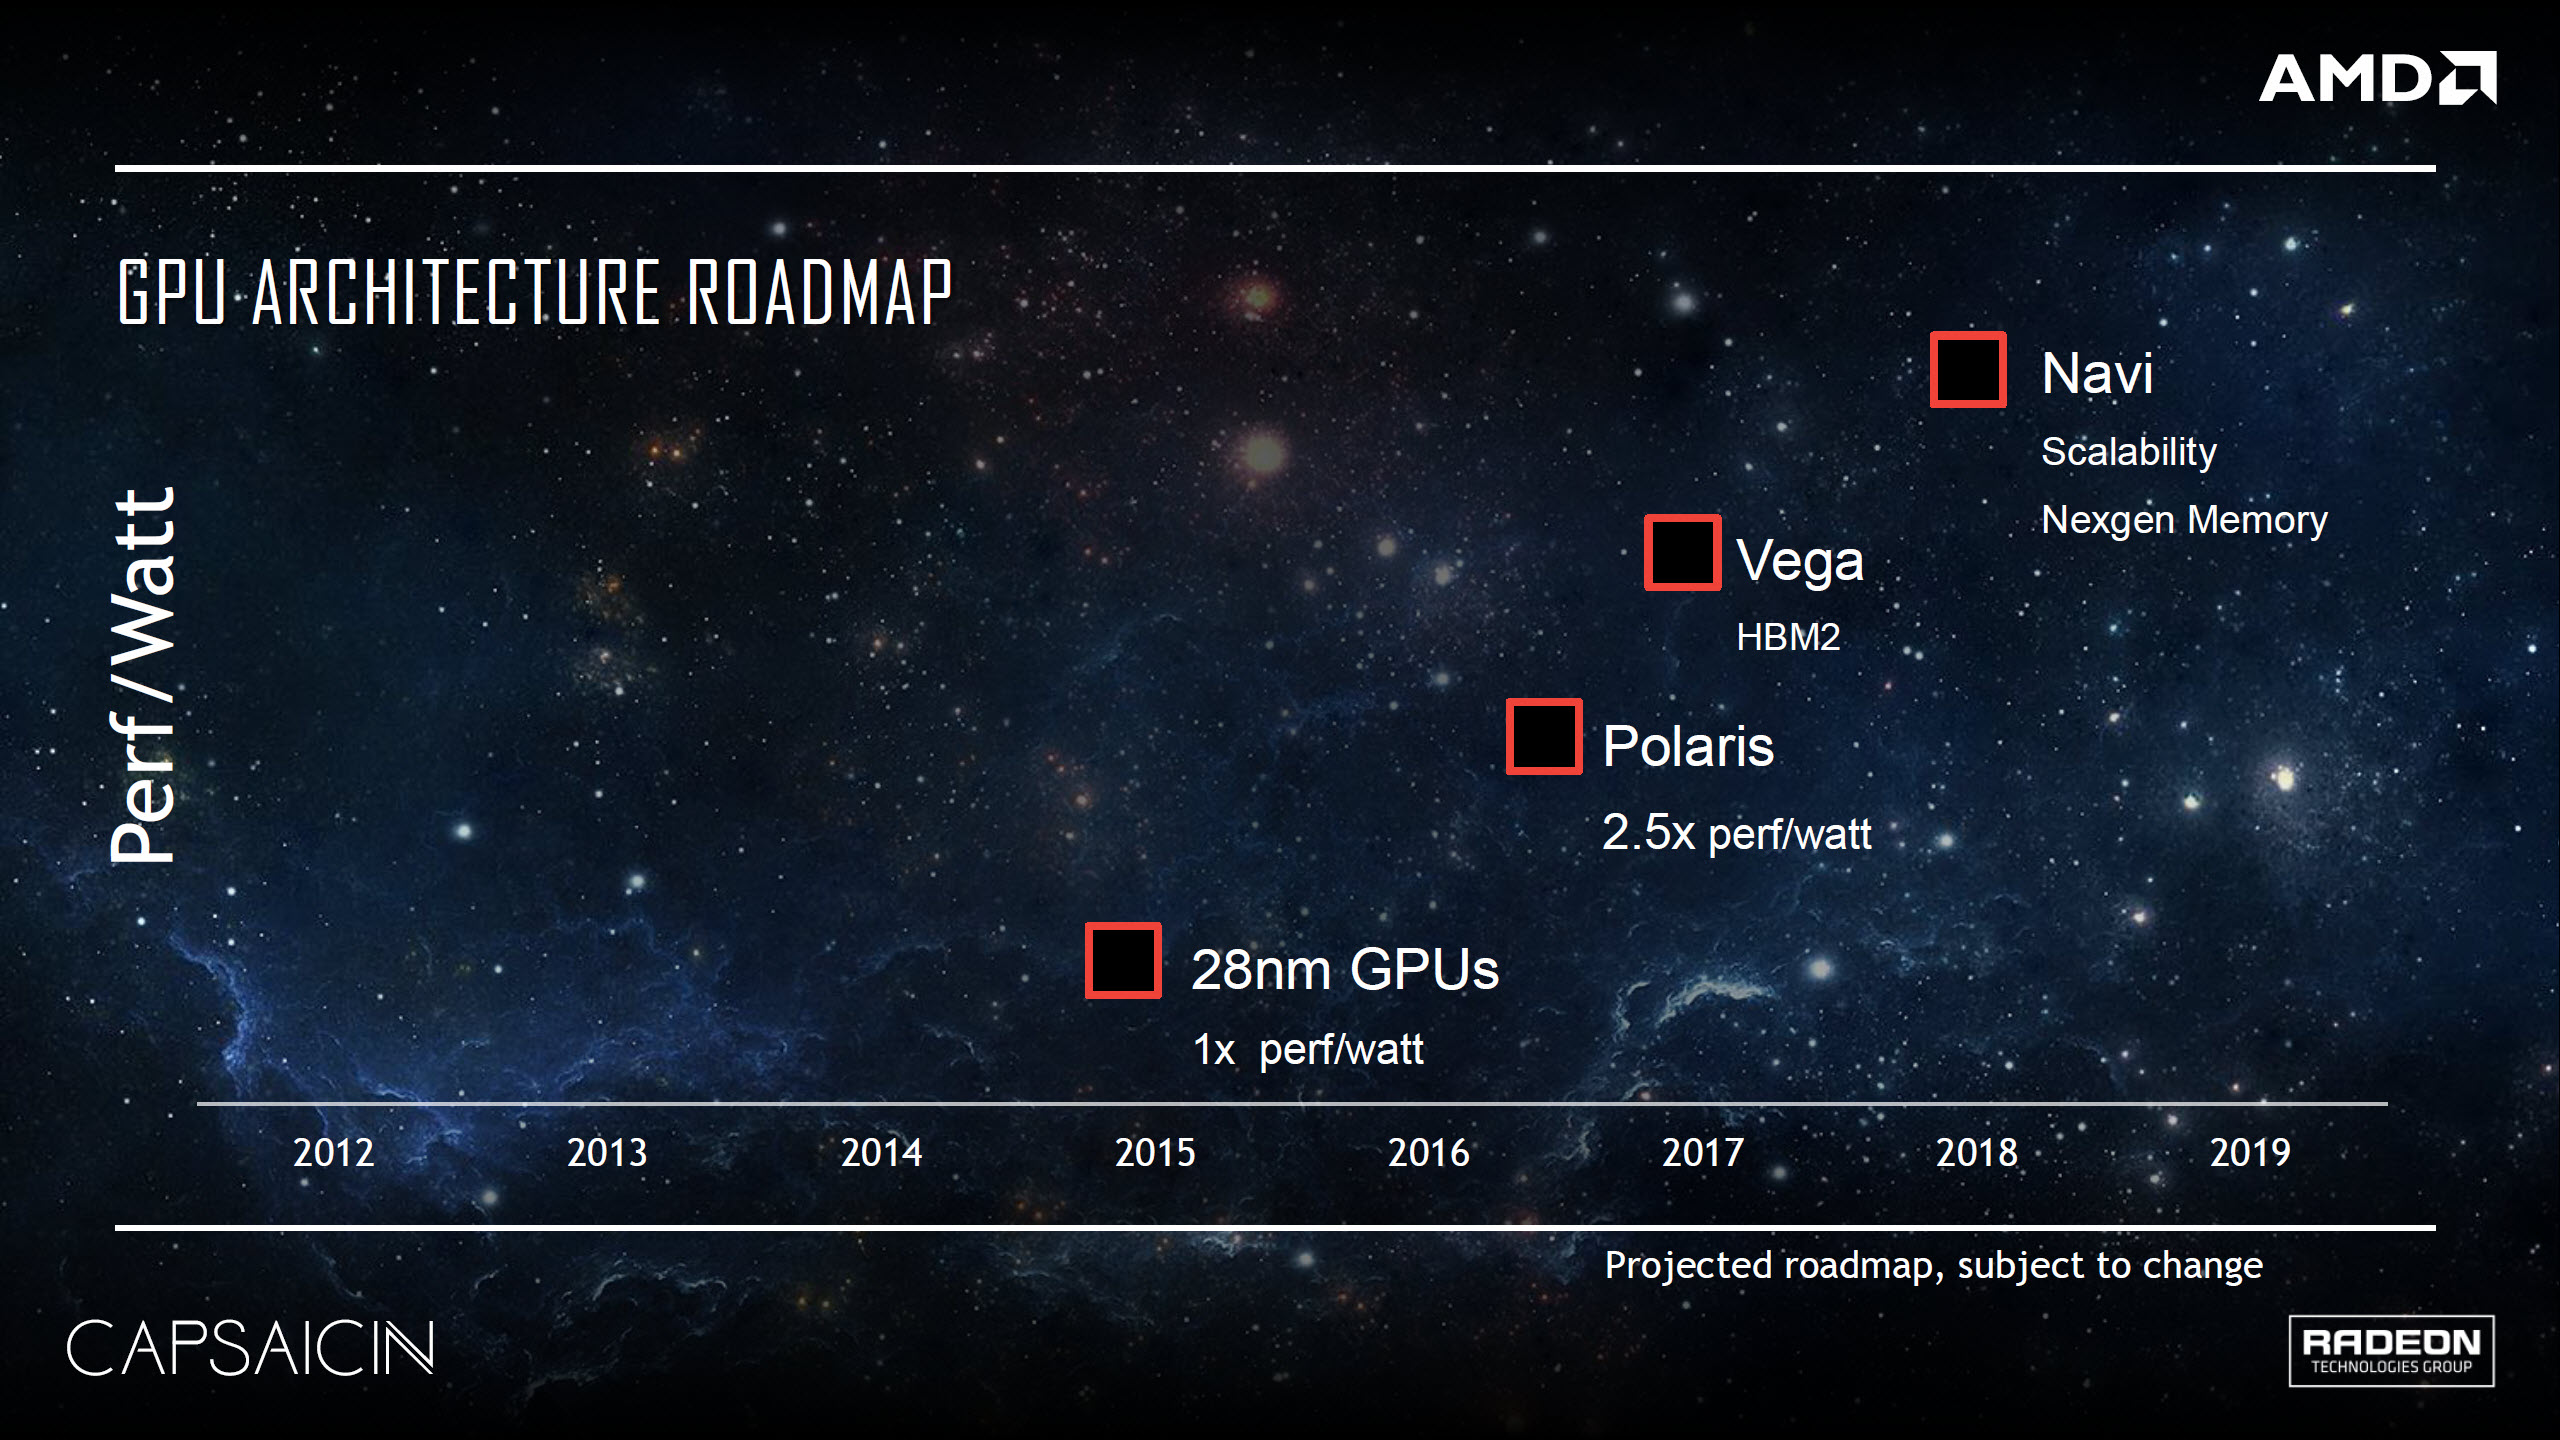 AMDs High End Vega 10 GPU Rumored For Launch In 2017